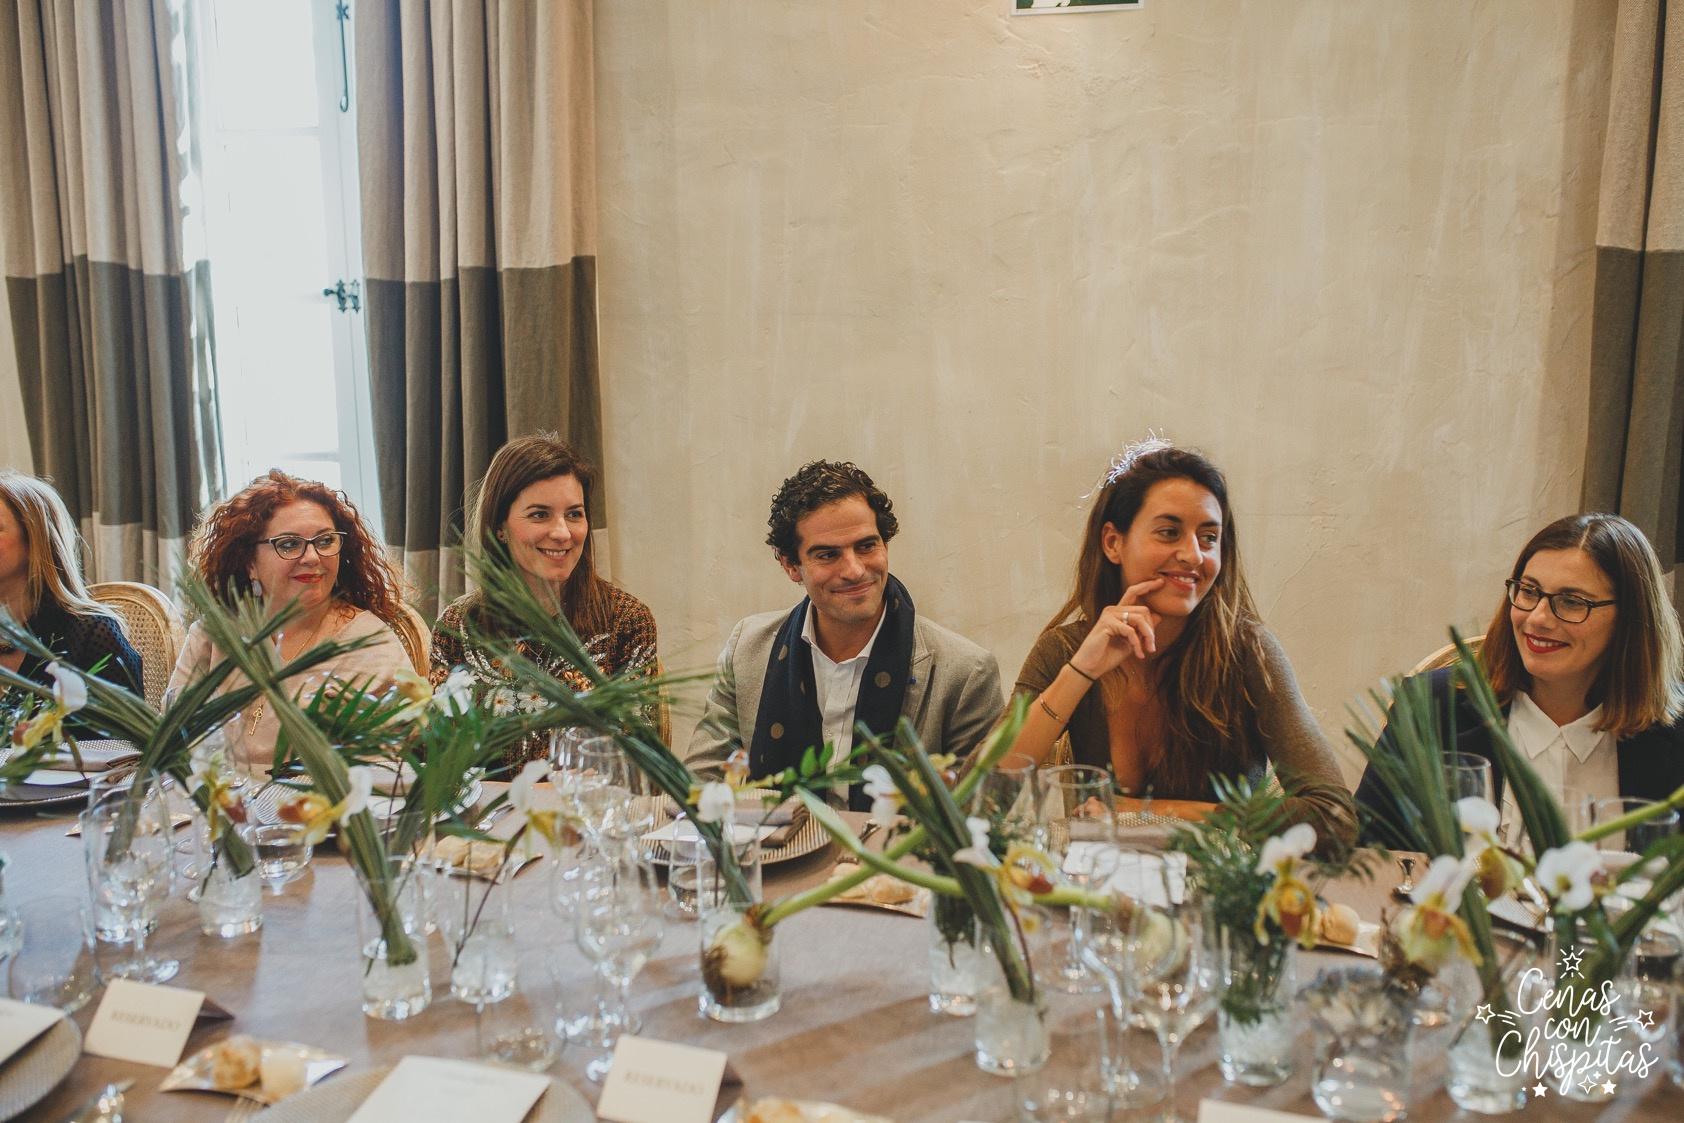 Cenas-con-Chispitas-Atelier-Dani-García-Gisela-Intimates